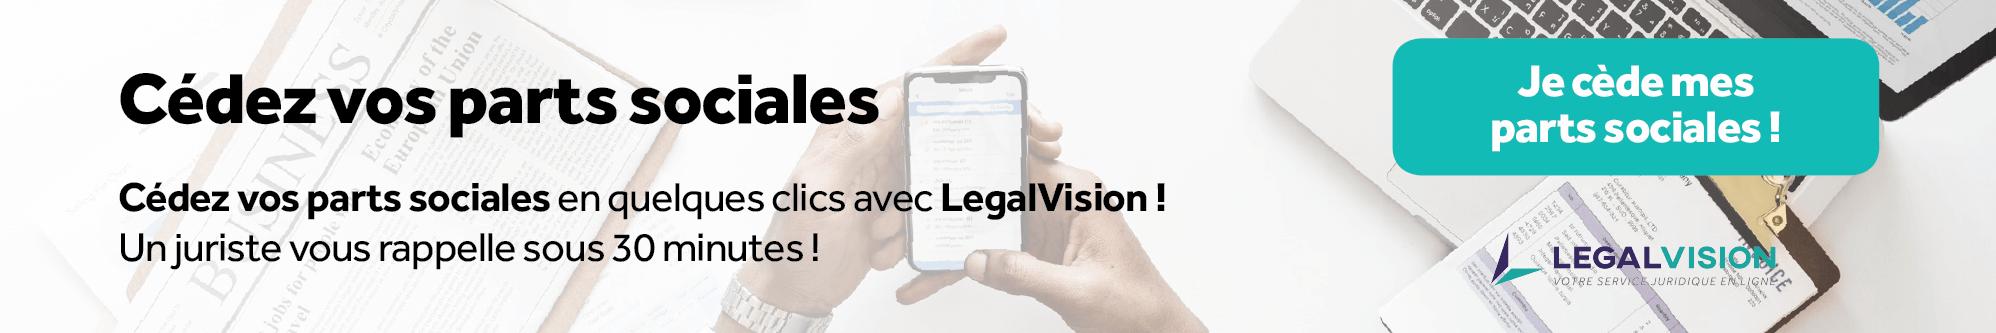 Nouveau call-to-action